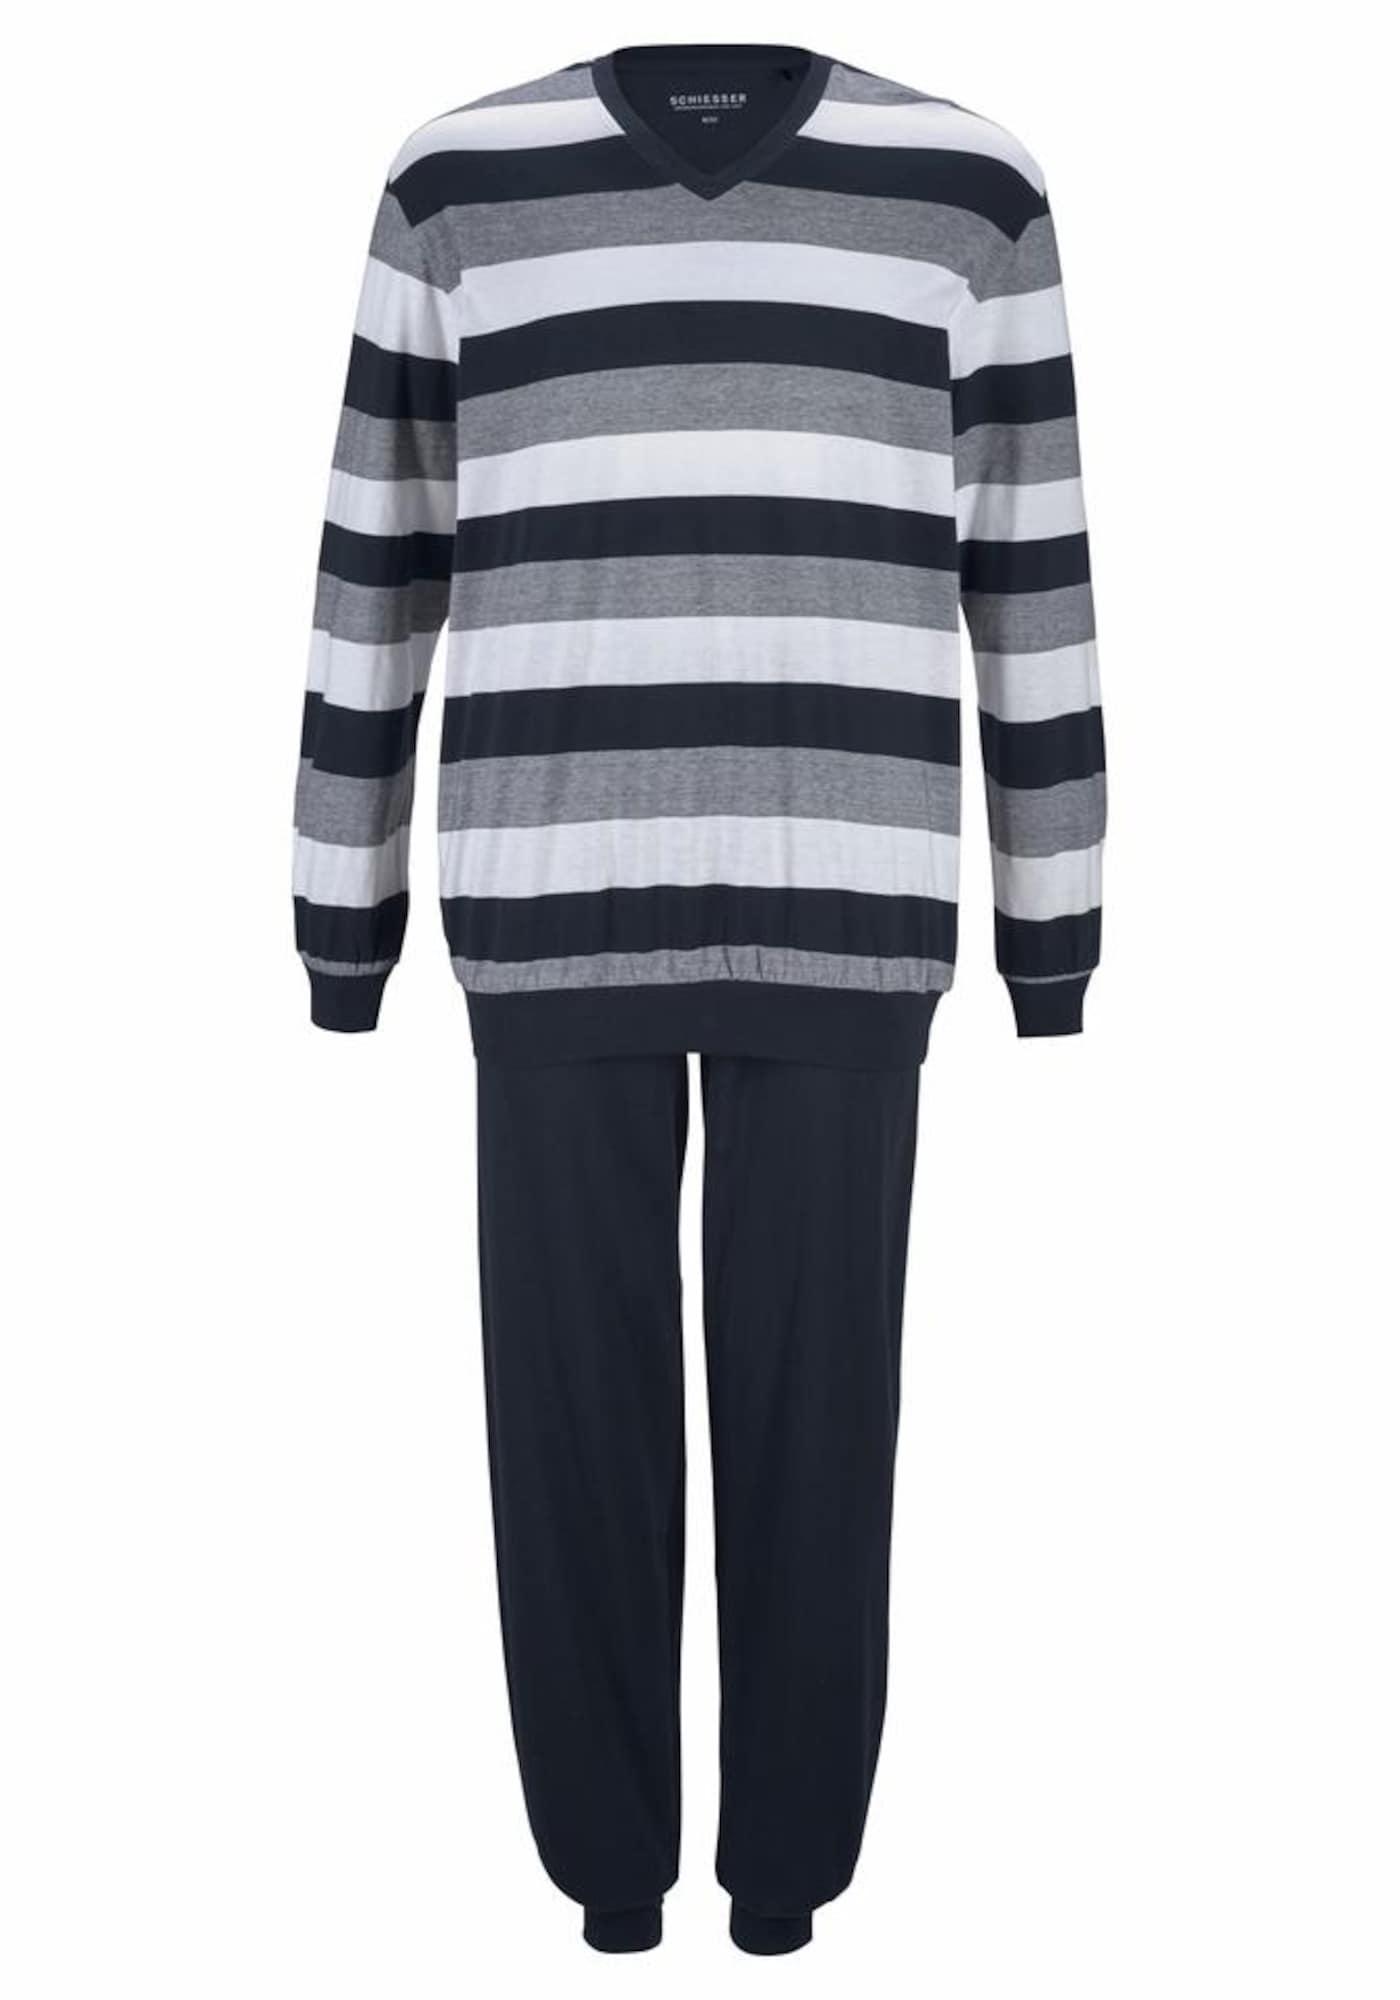 SCHIESSER Ilga pižama tamsiai mėlyna / pilka / balta